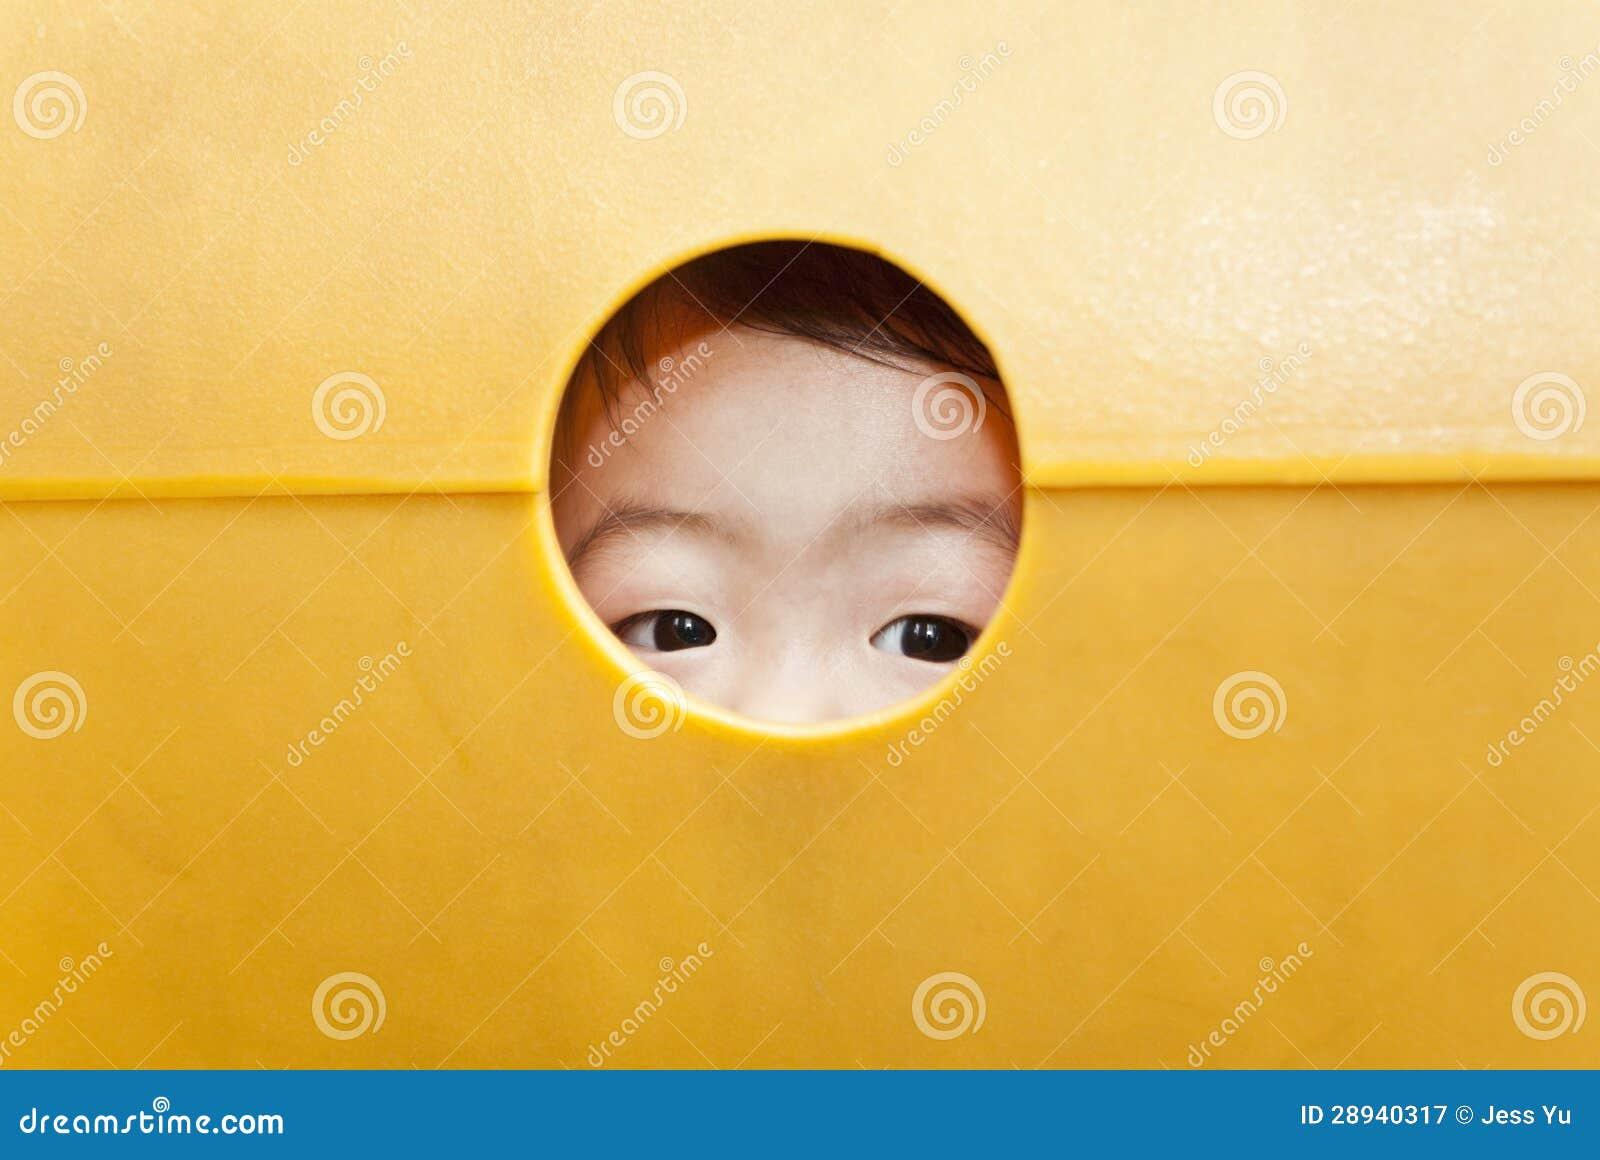 Children curious eyes